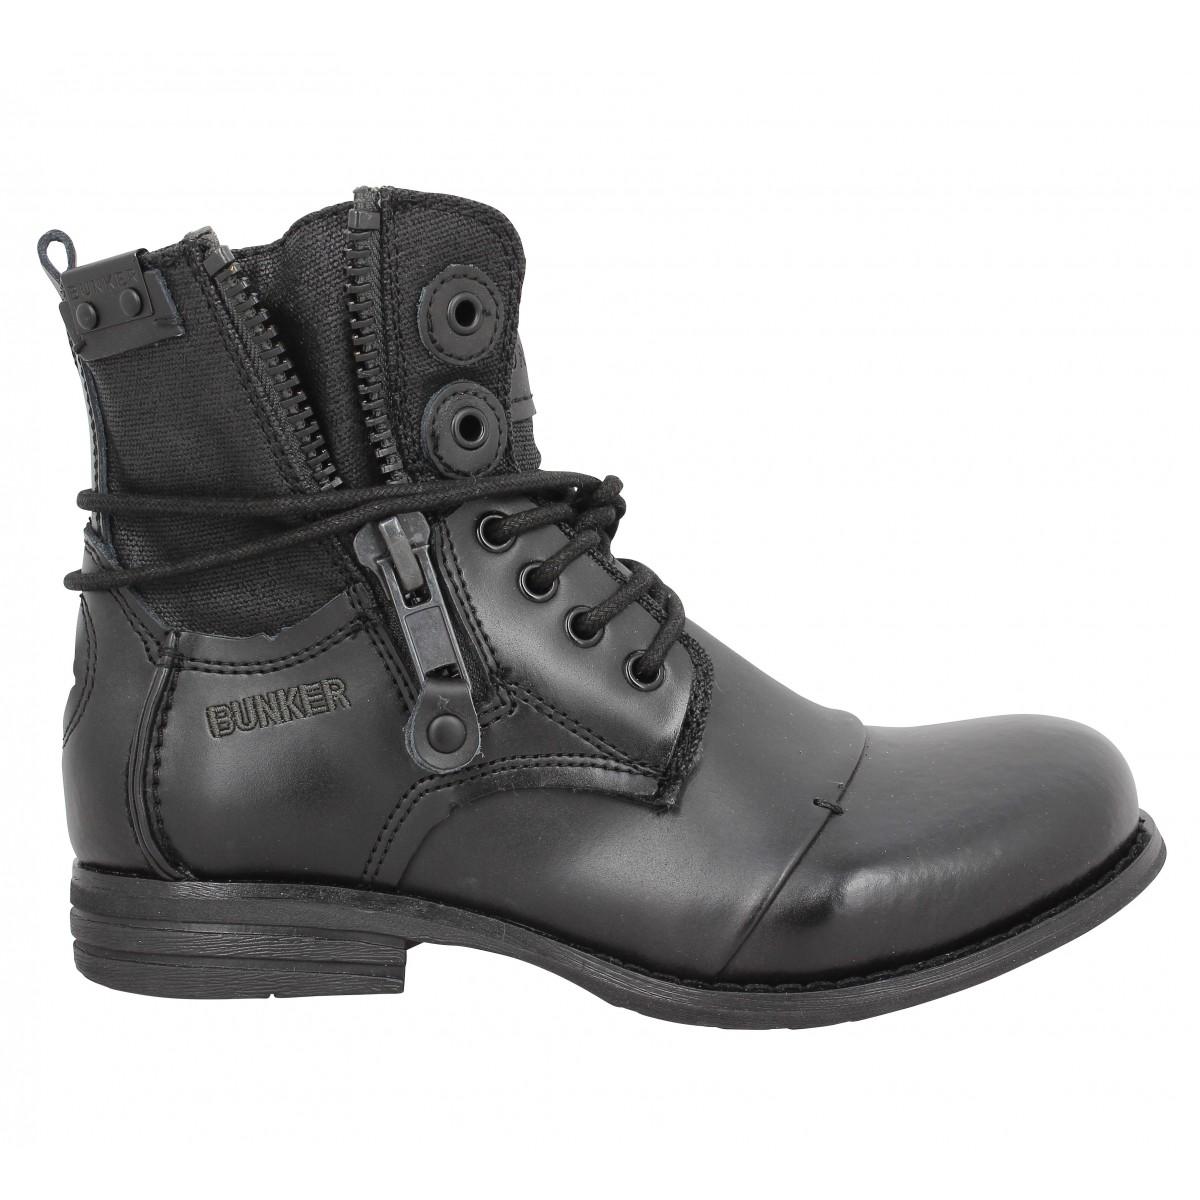 Bunker Homme Femme boots Meilleures Brandalley Noir Offres bunker kZuPXi